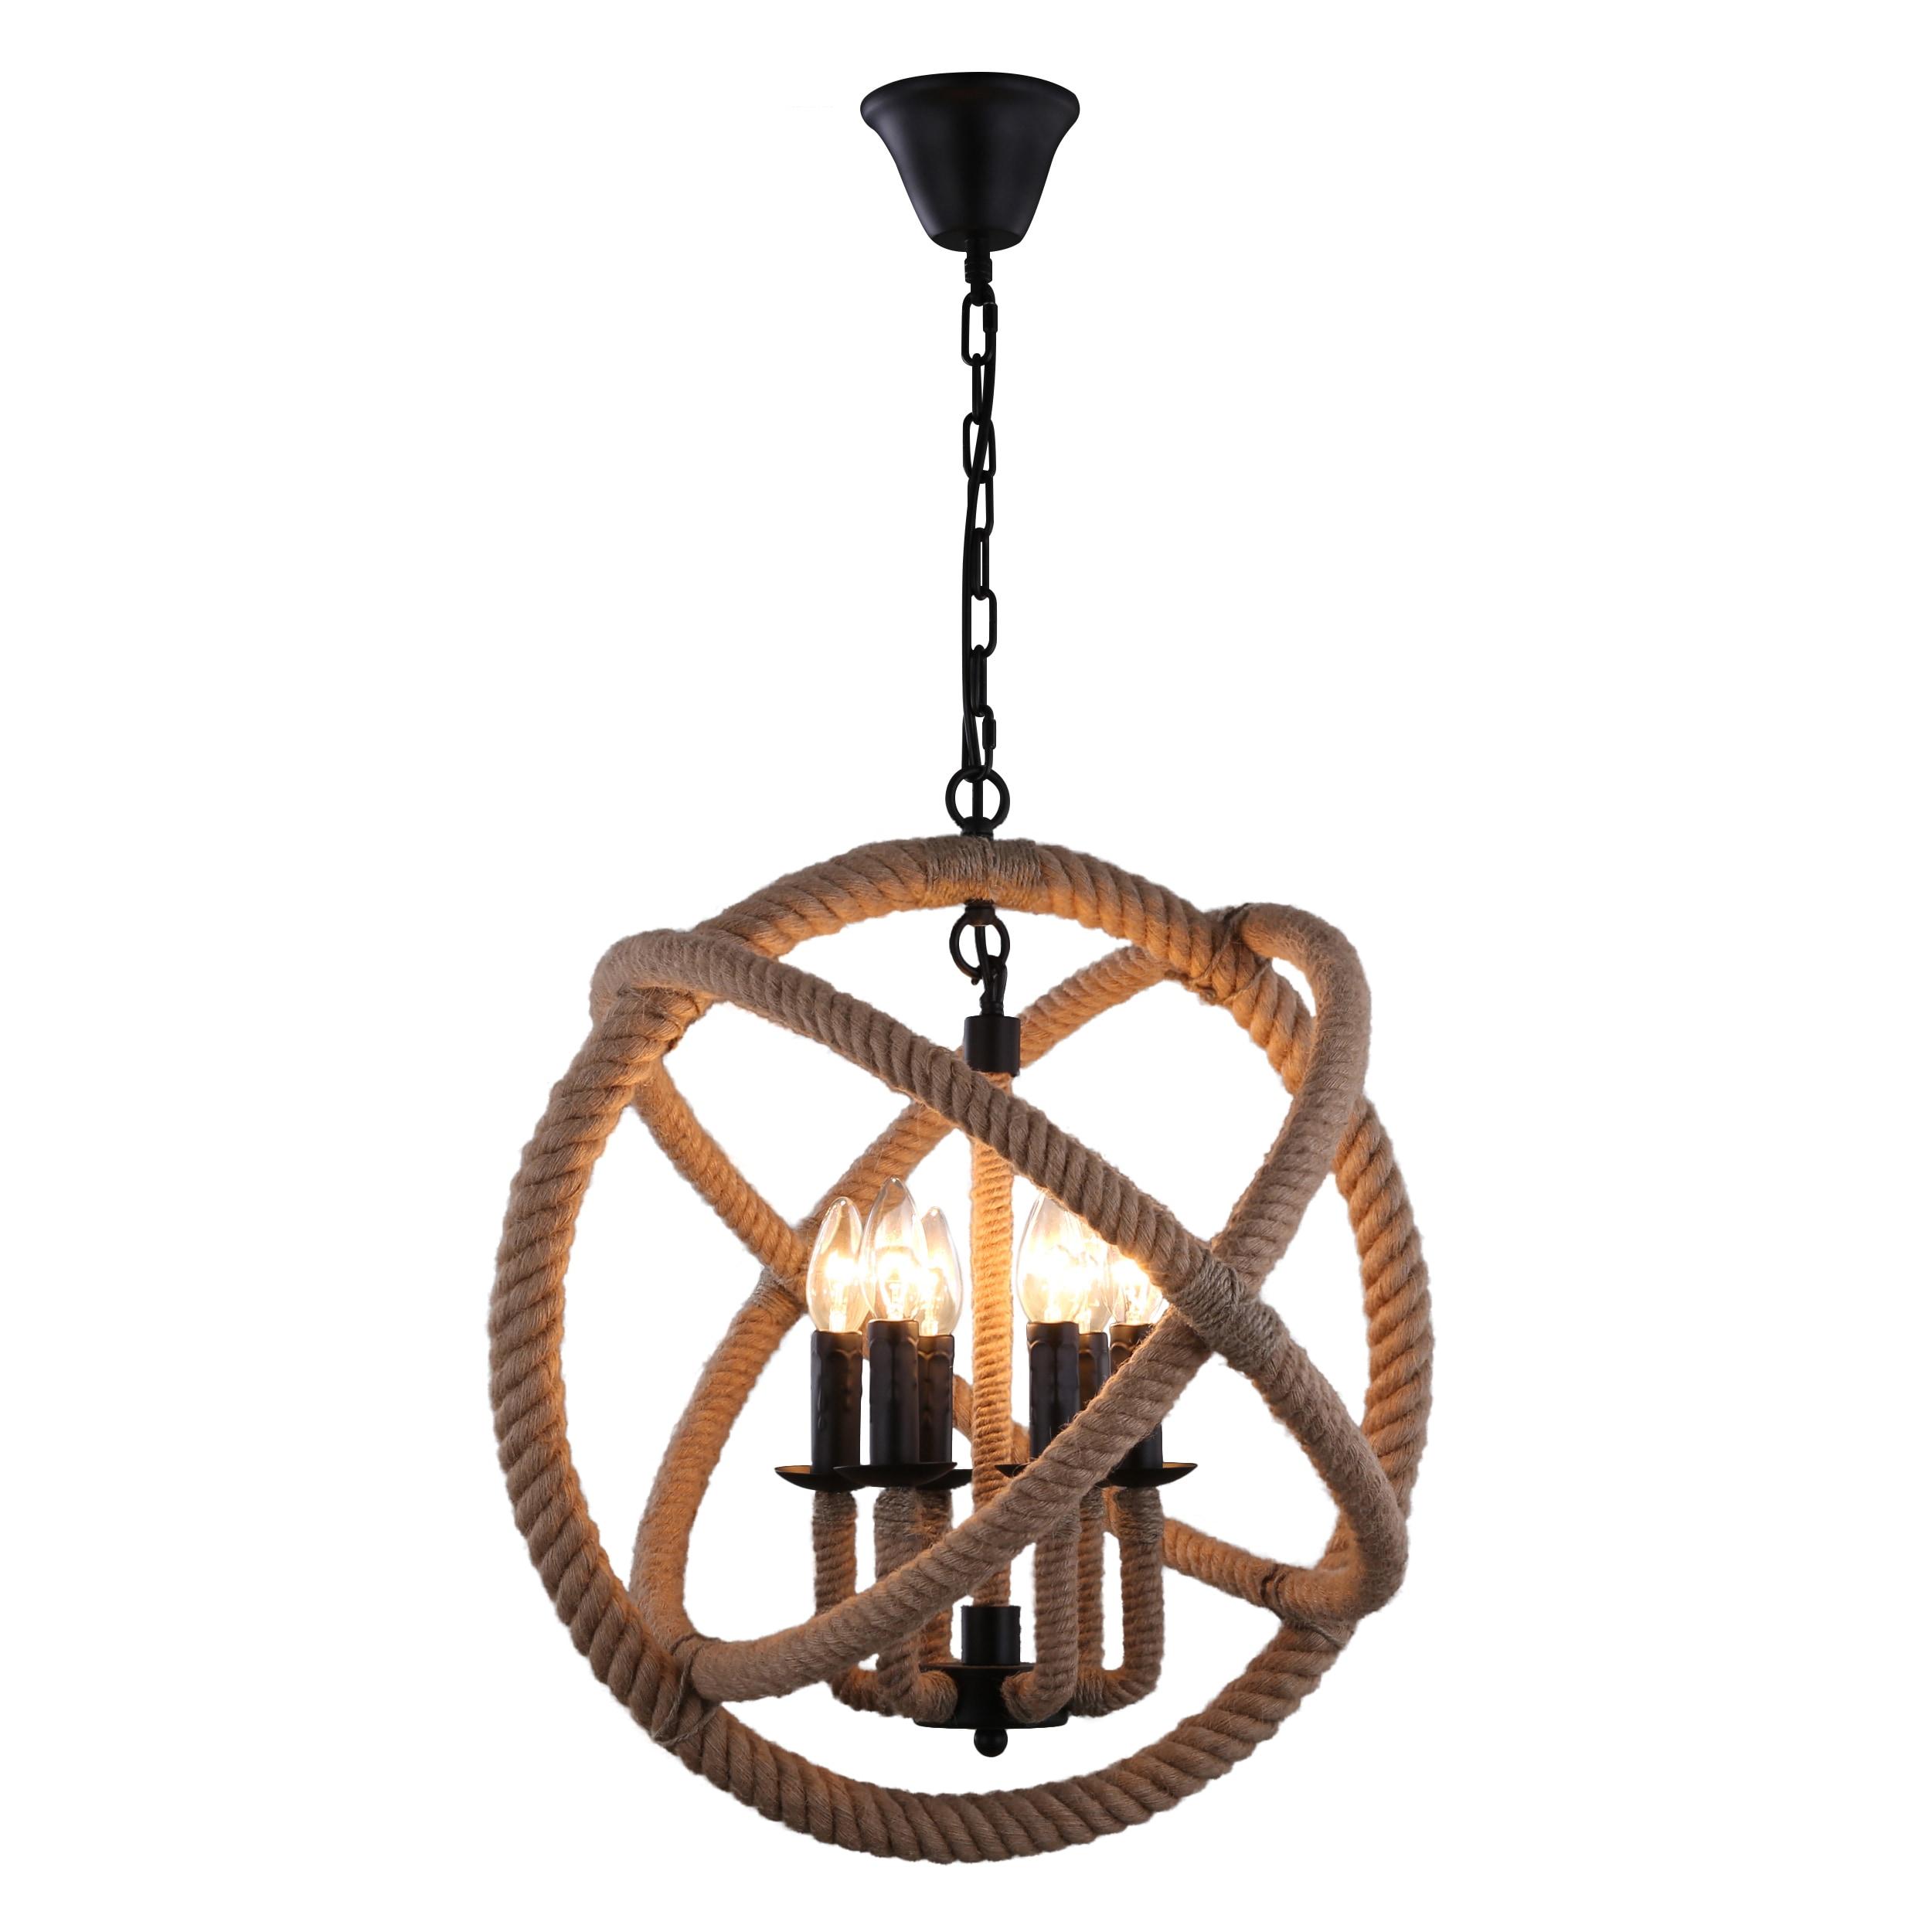 journee lighting. Journee Home \u0027Ouija\u0027 14 In Hard Wired Hemp Rope Orb Pendant Light With Included Edison Bulb - Free Shipping Today Overstock 20677338 Lighting 0